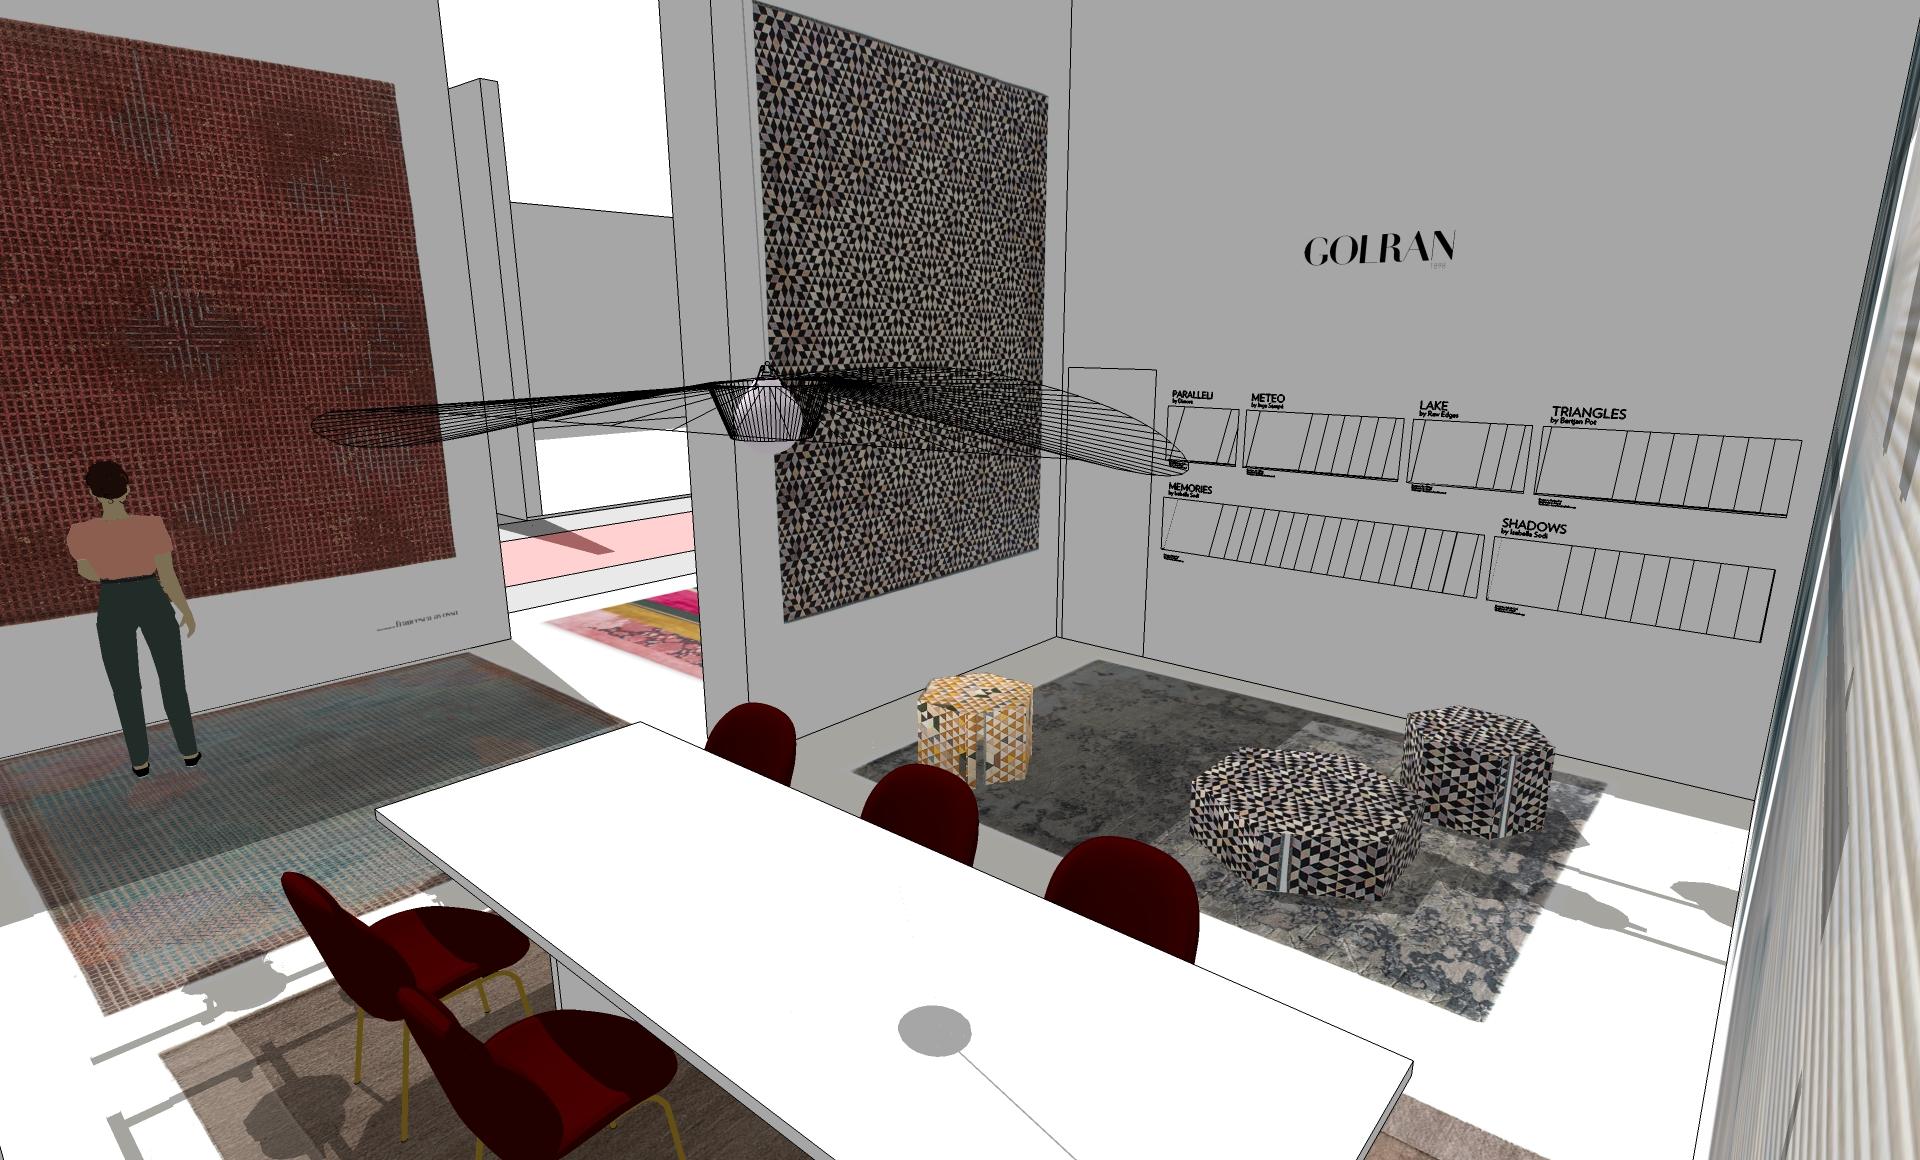 Golran Stand Maison et Objet 2017 – Scenography – Stand Design – 3D – 04